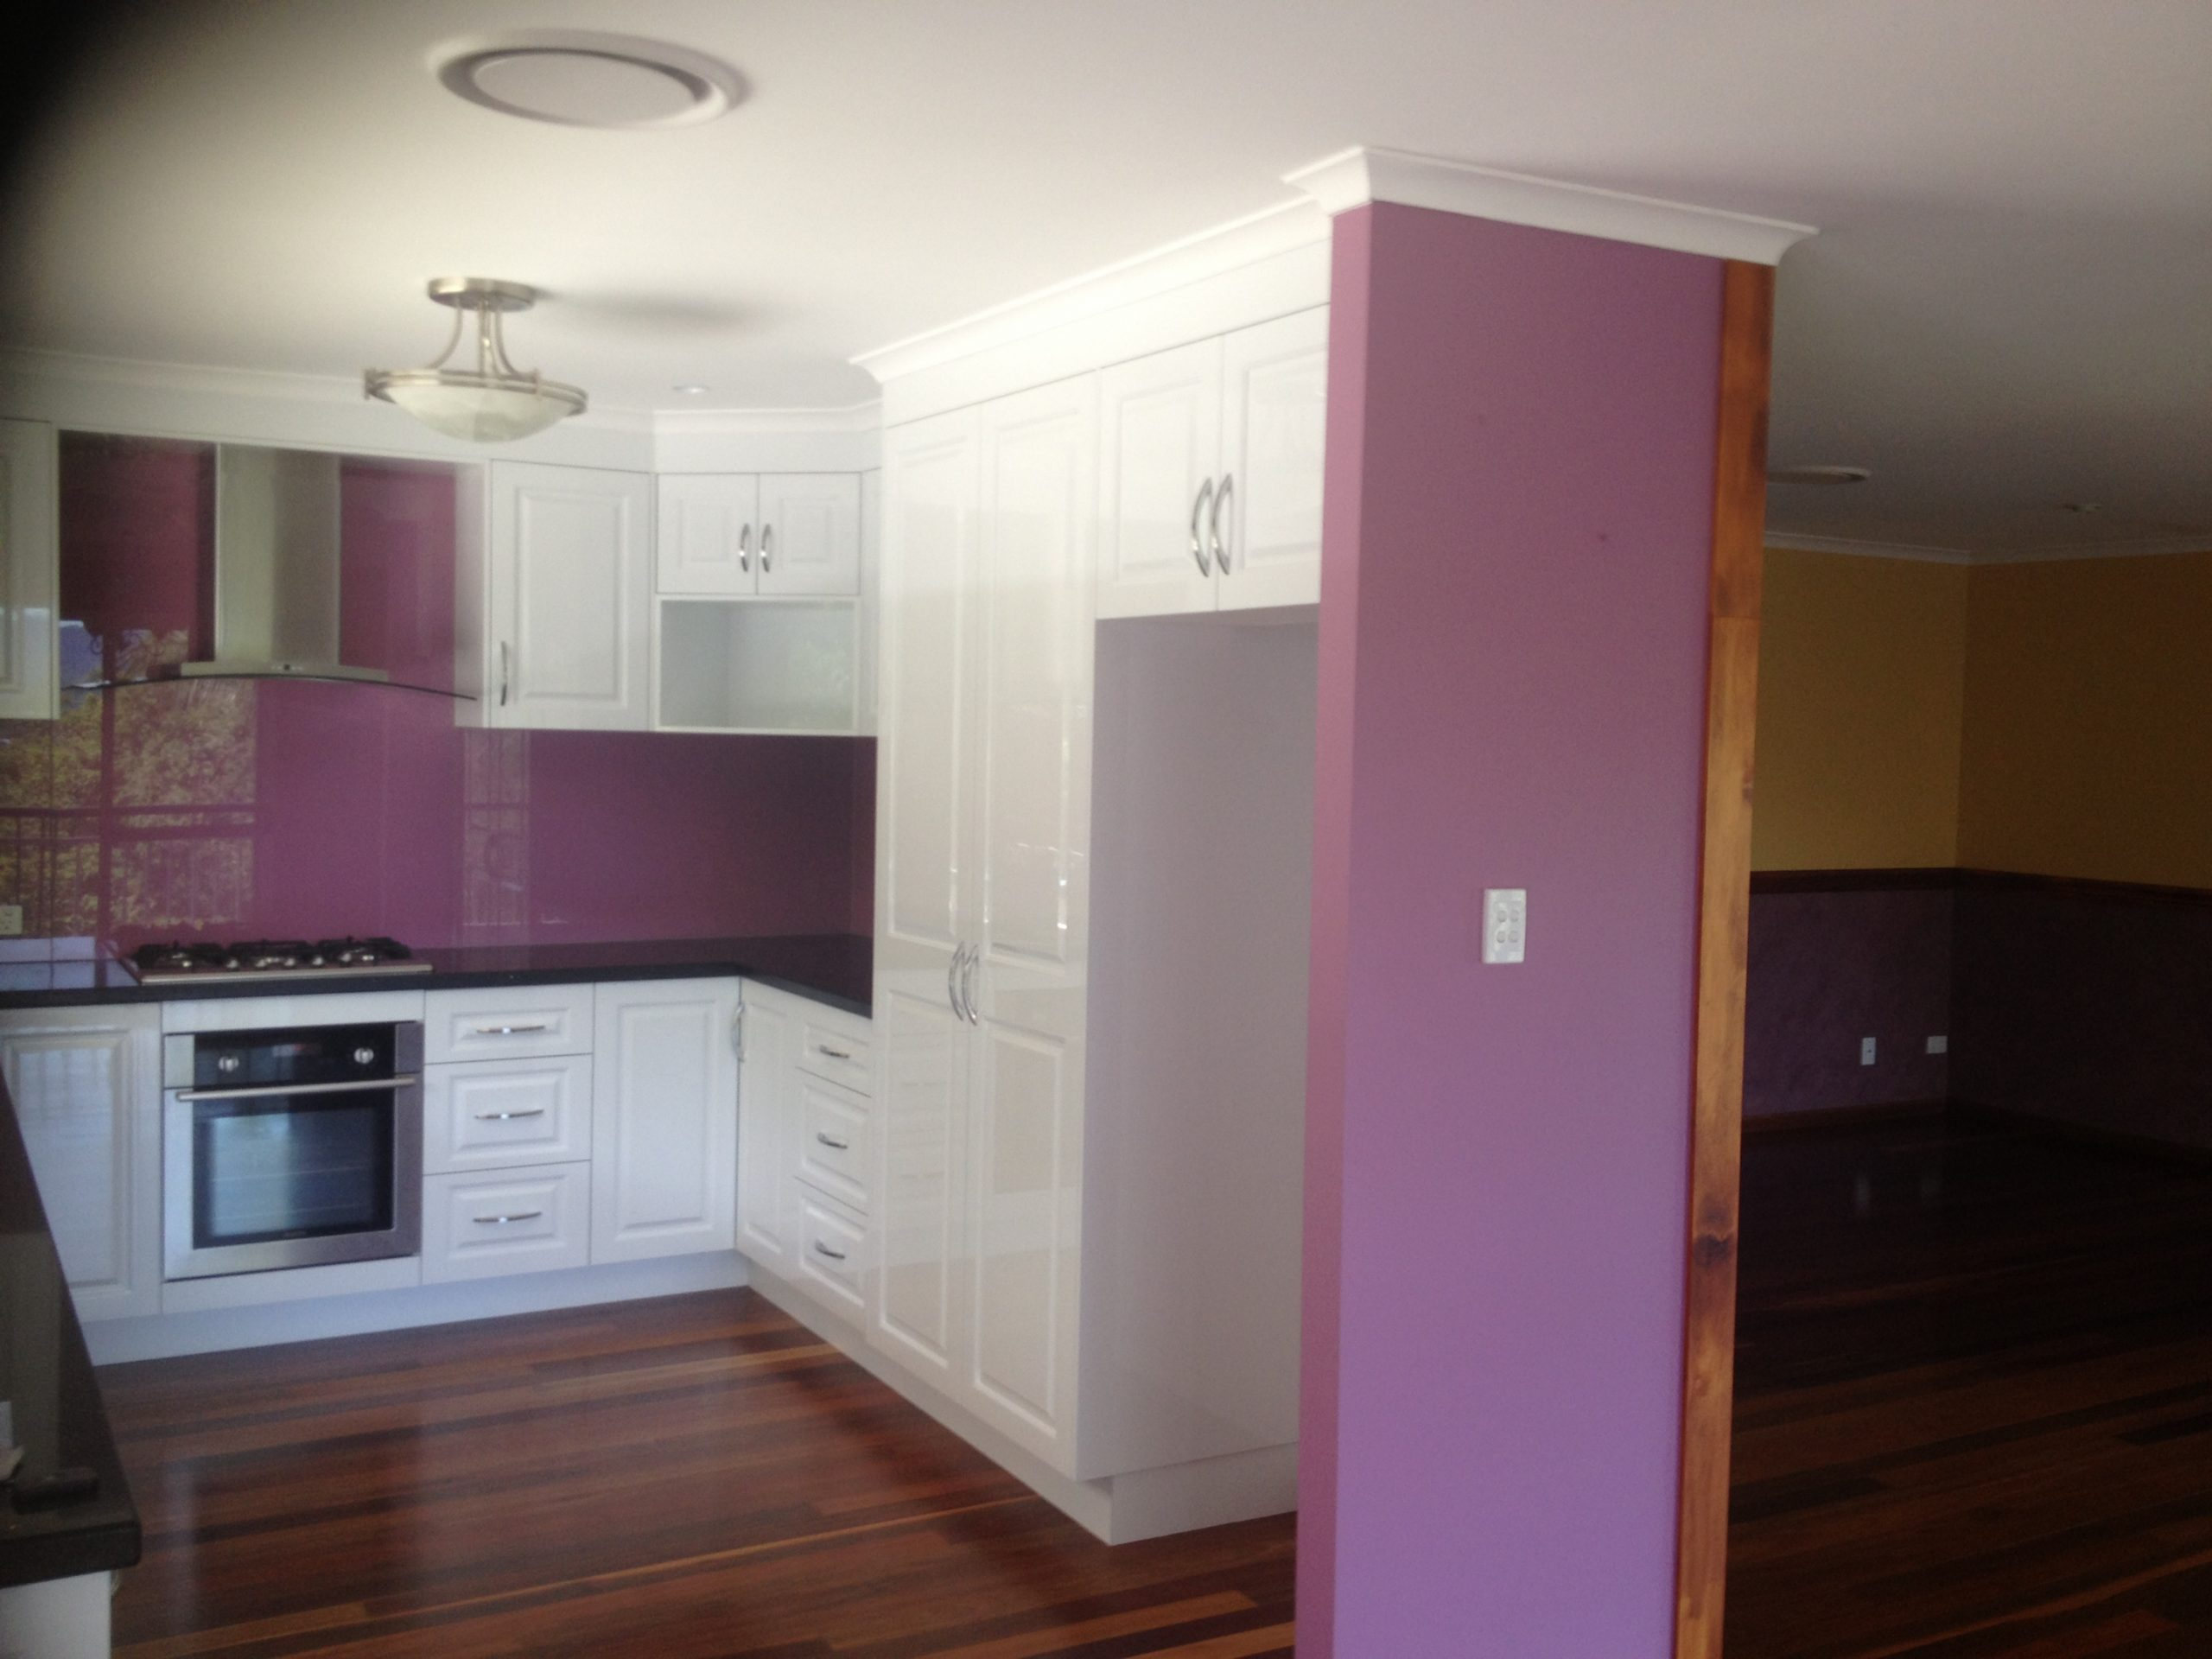 Before_Image_purple_walls